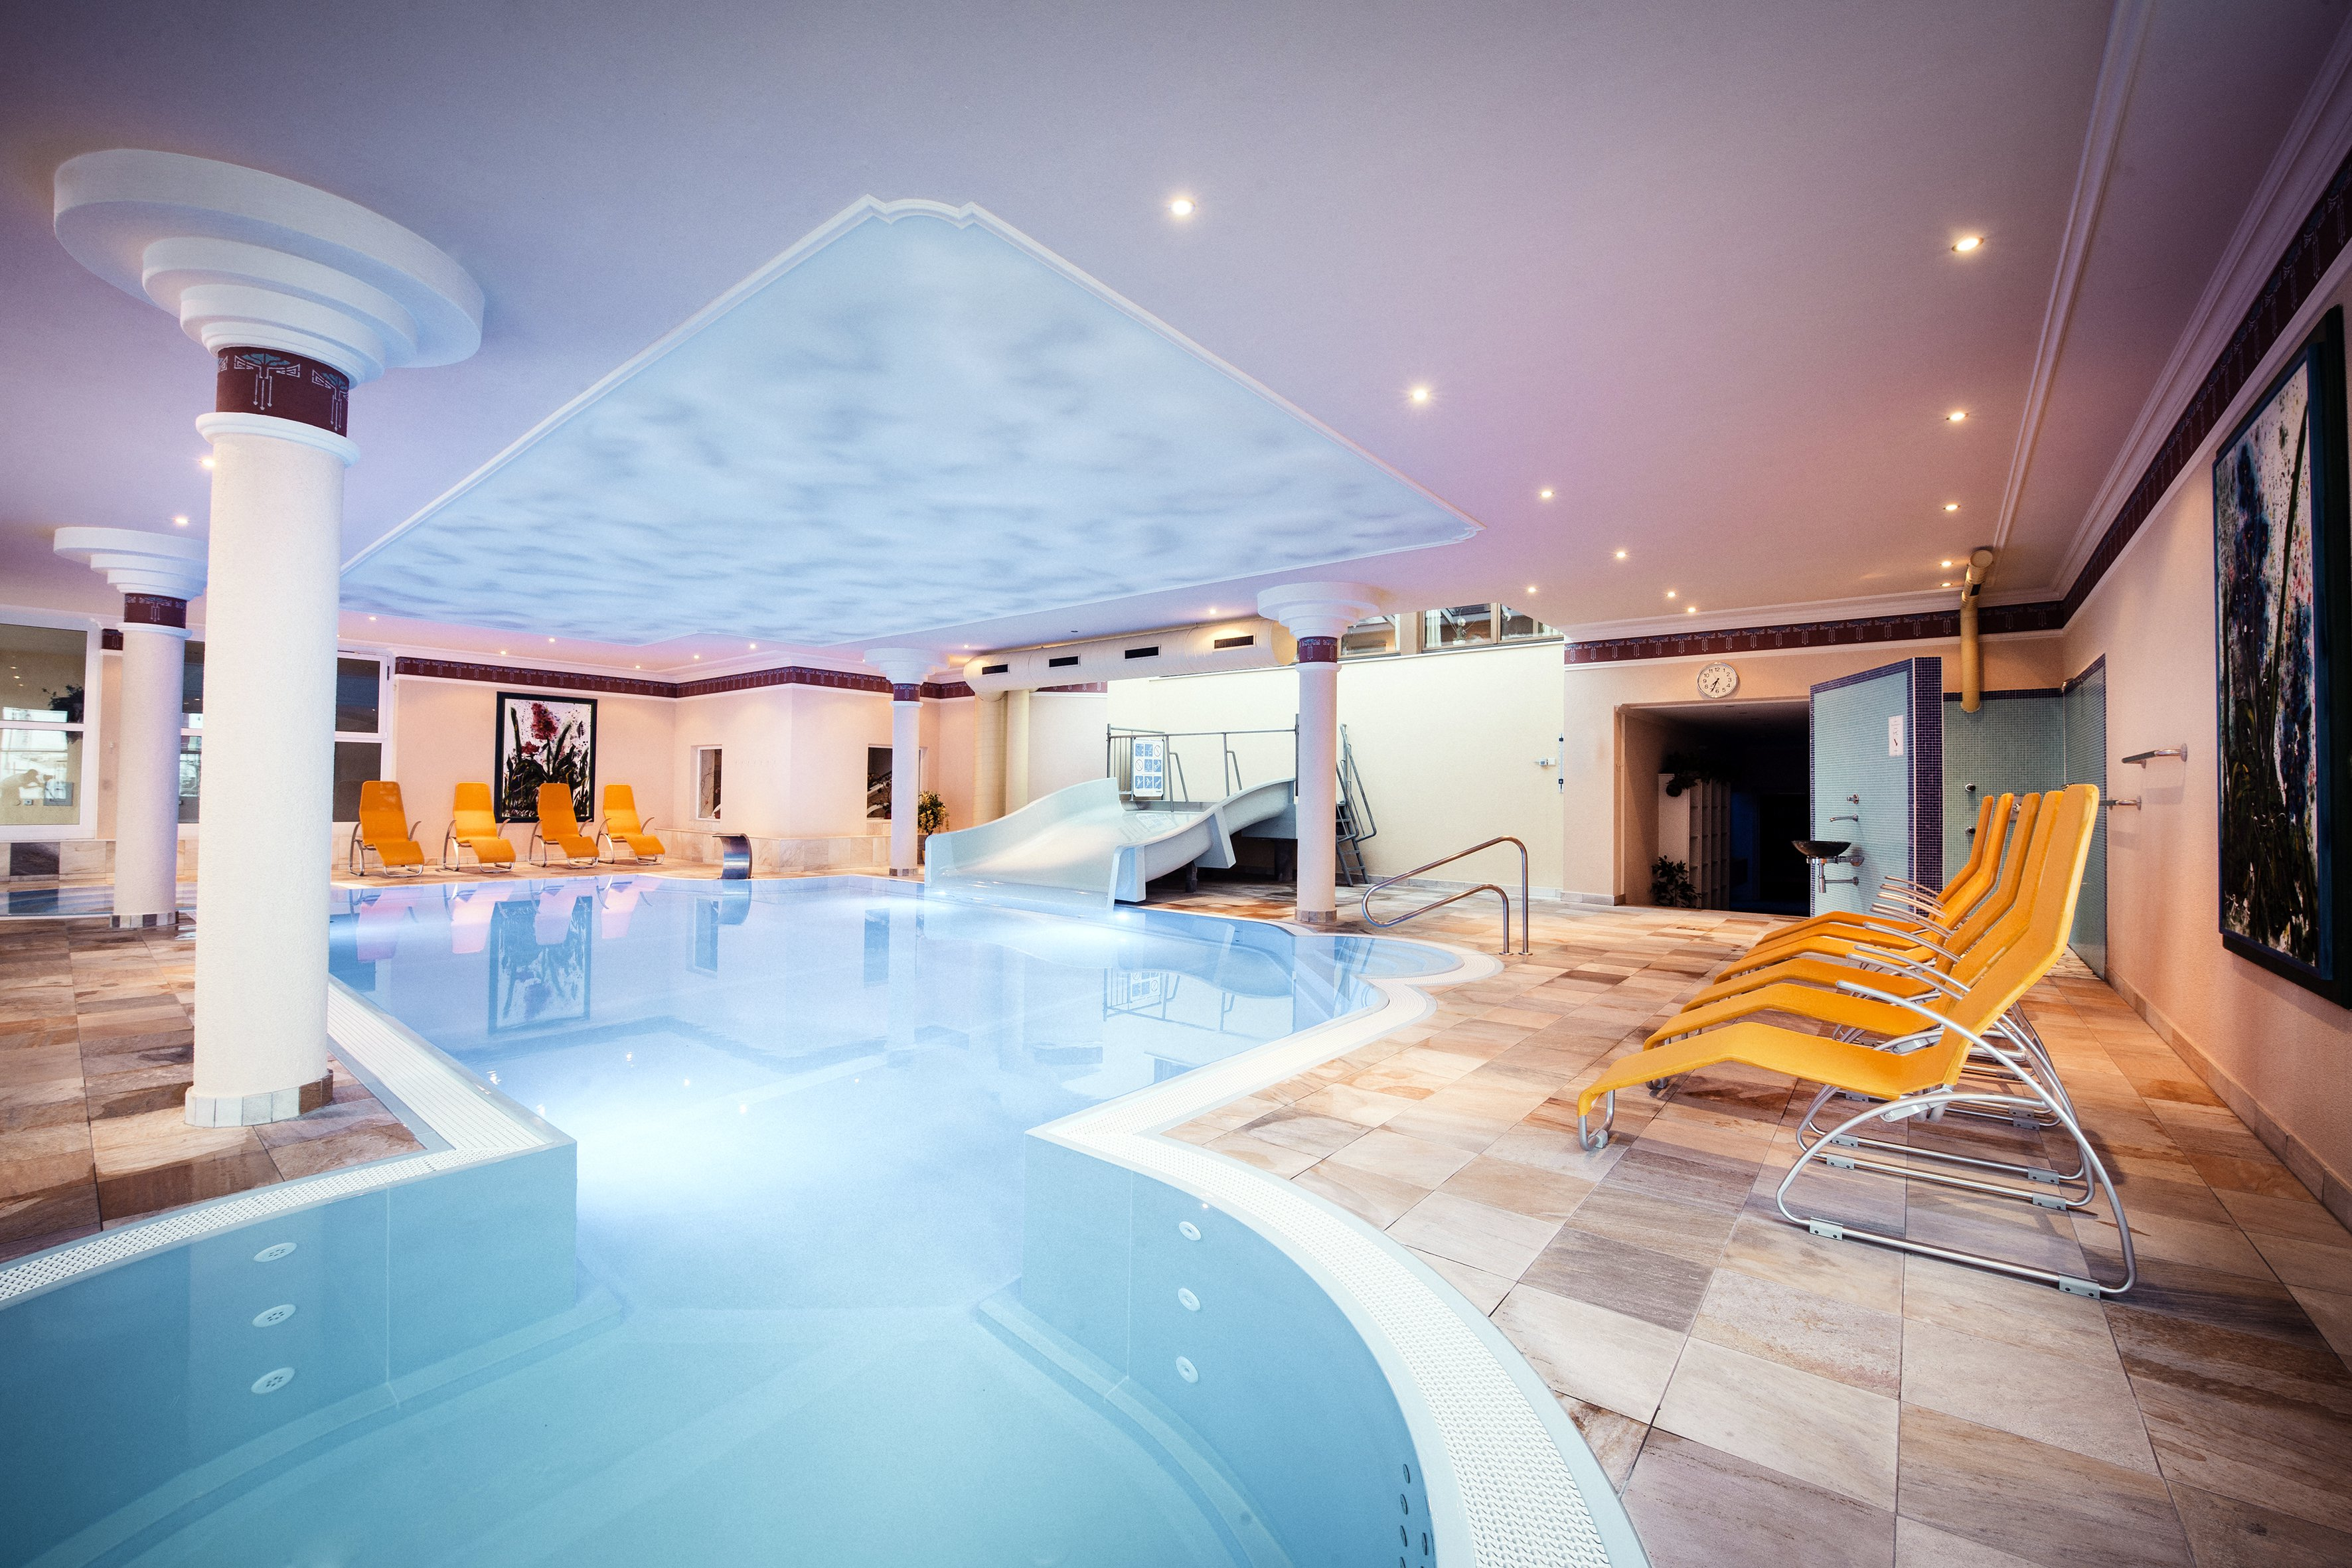 Endless Sky Pool: Der höchstgelegene Infinity-Pool der Alpen ...